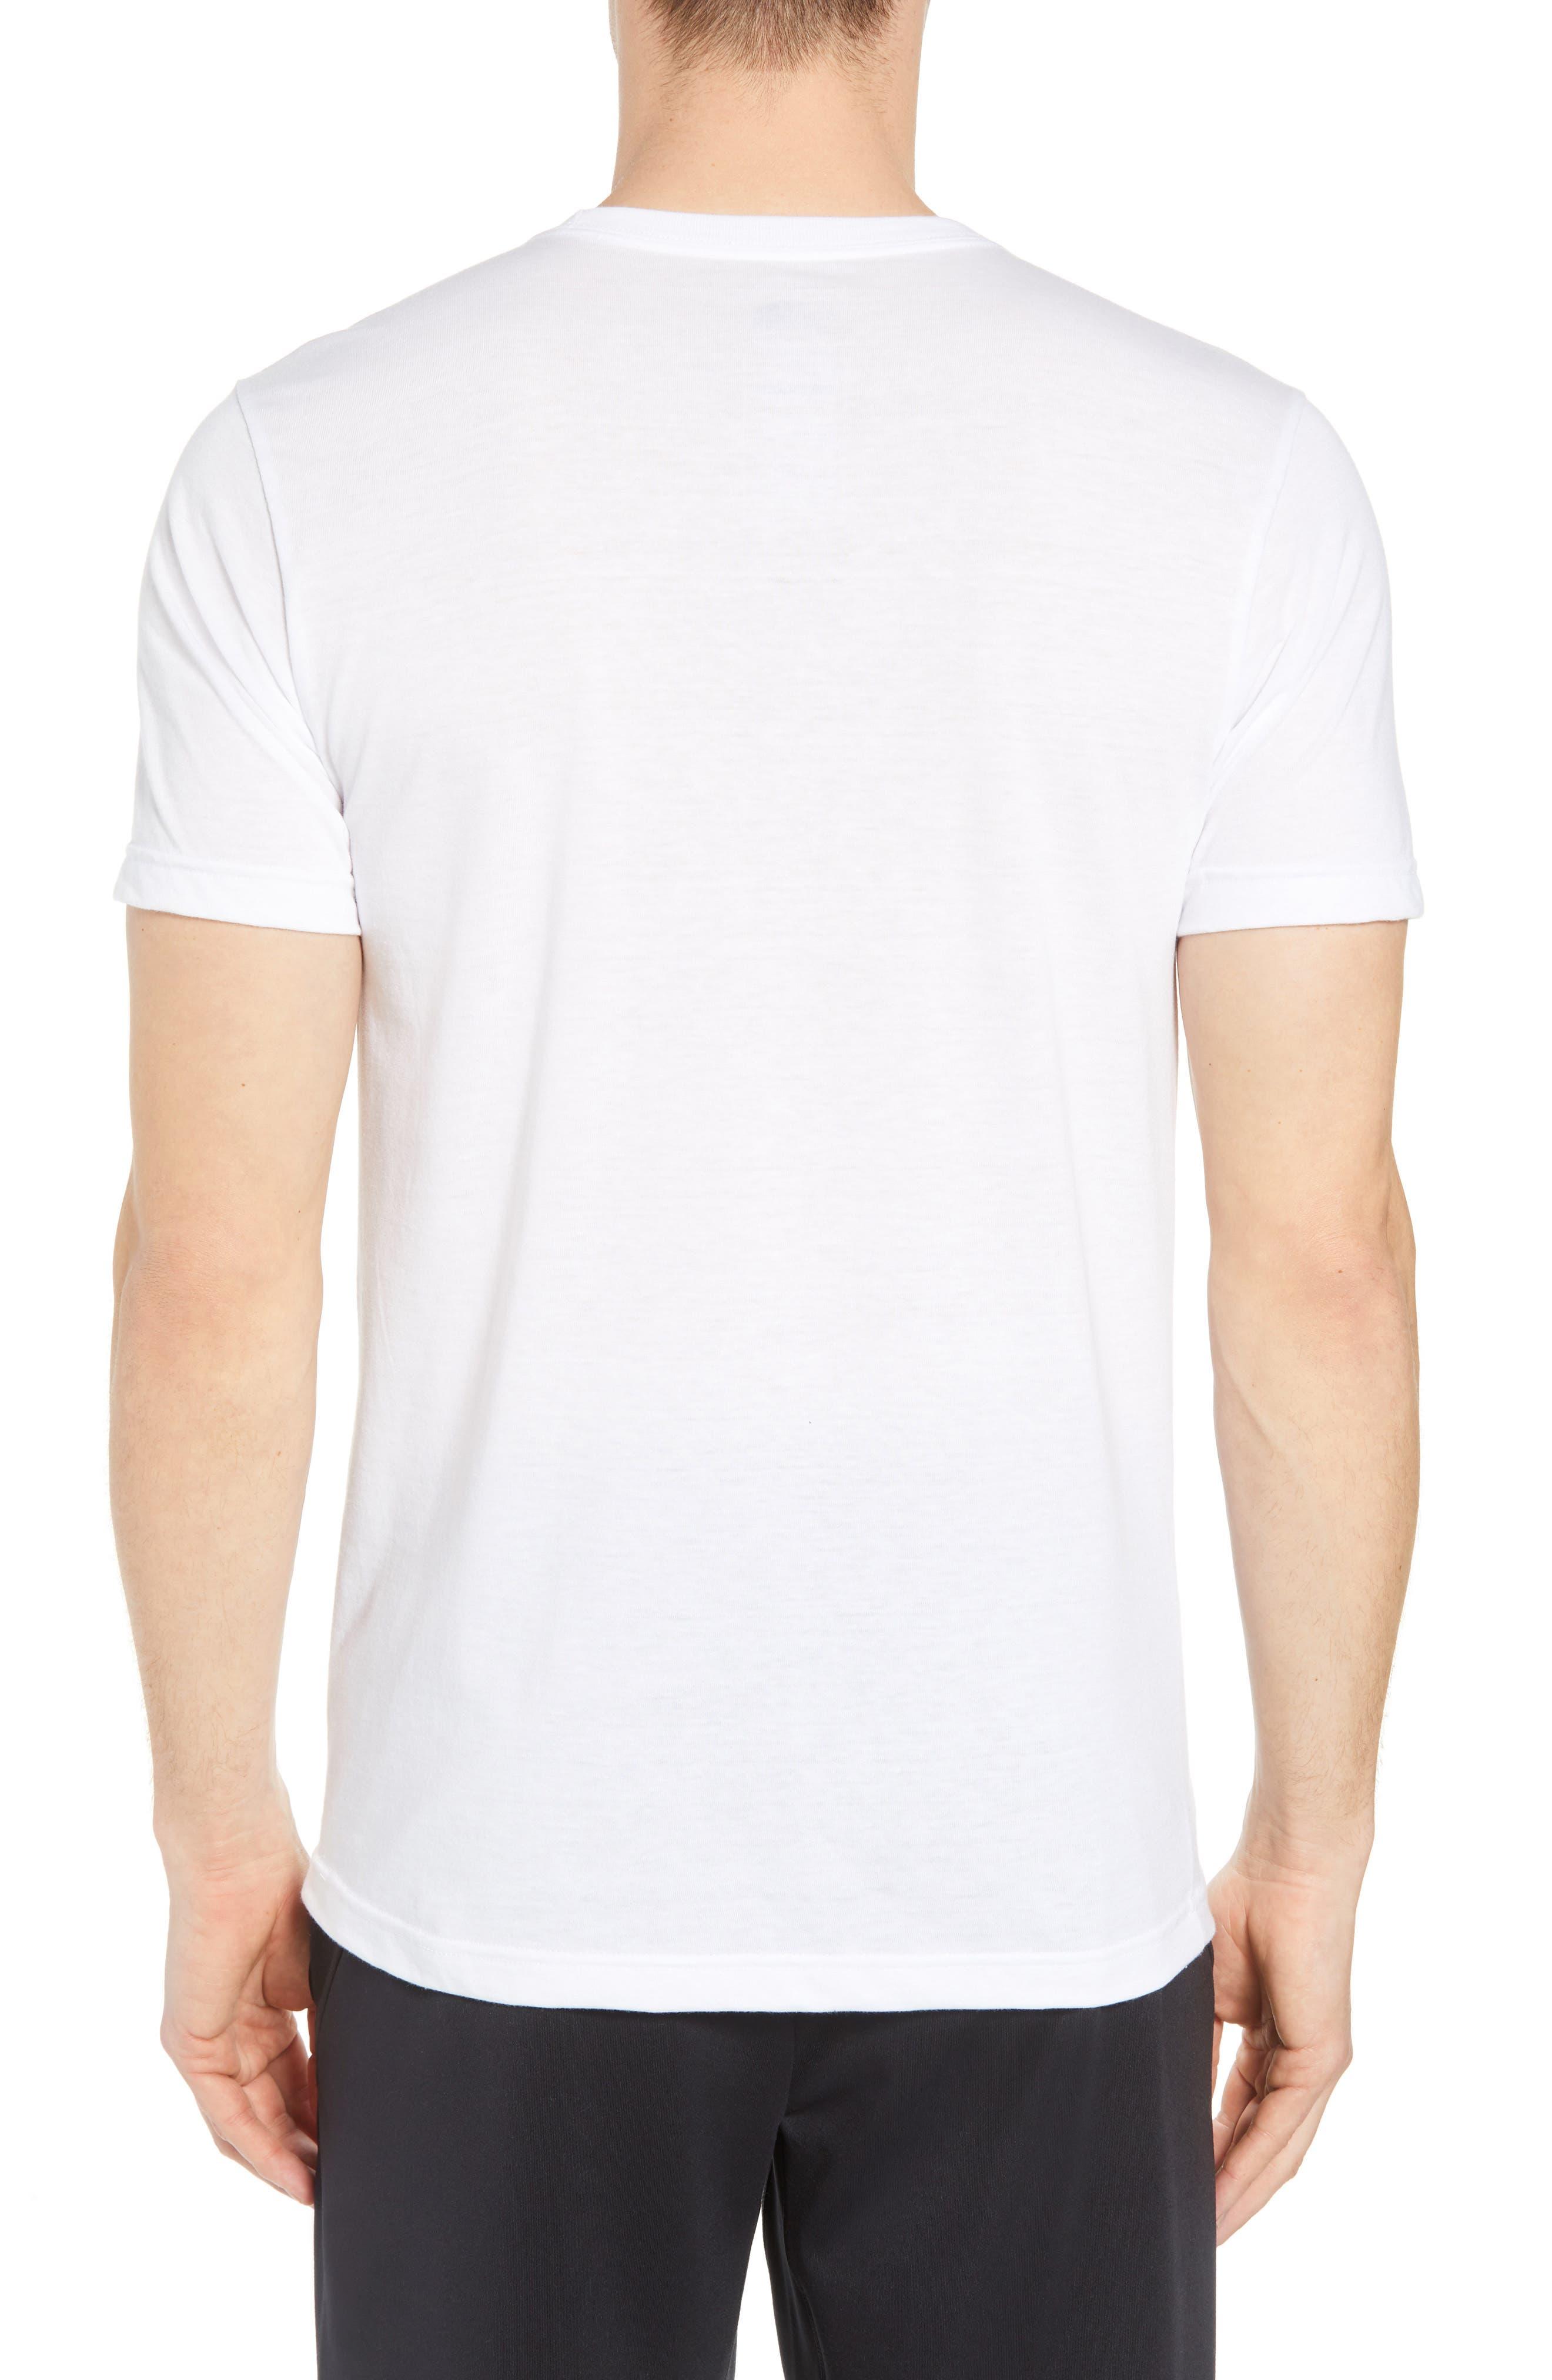 Americana Crewneck T-Shirt,                             Alternate thumbnail 2, color,                             Tnf White Heather